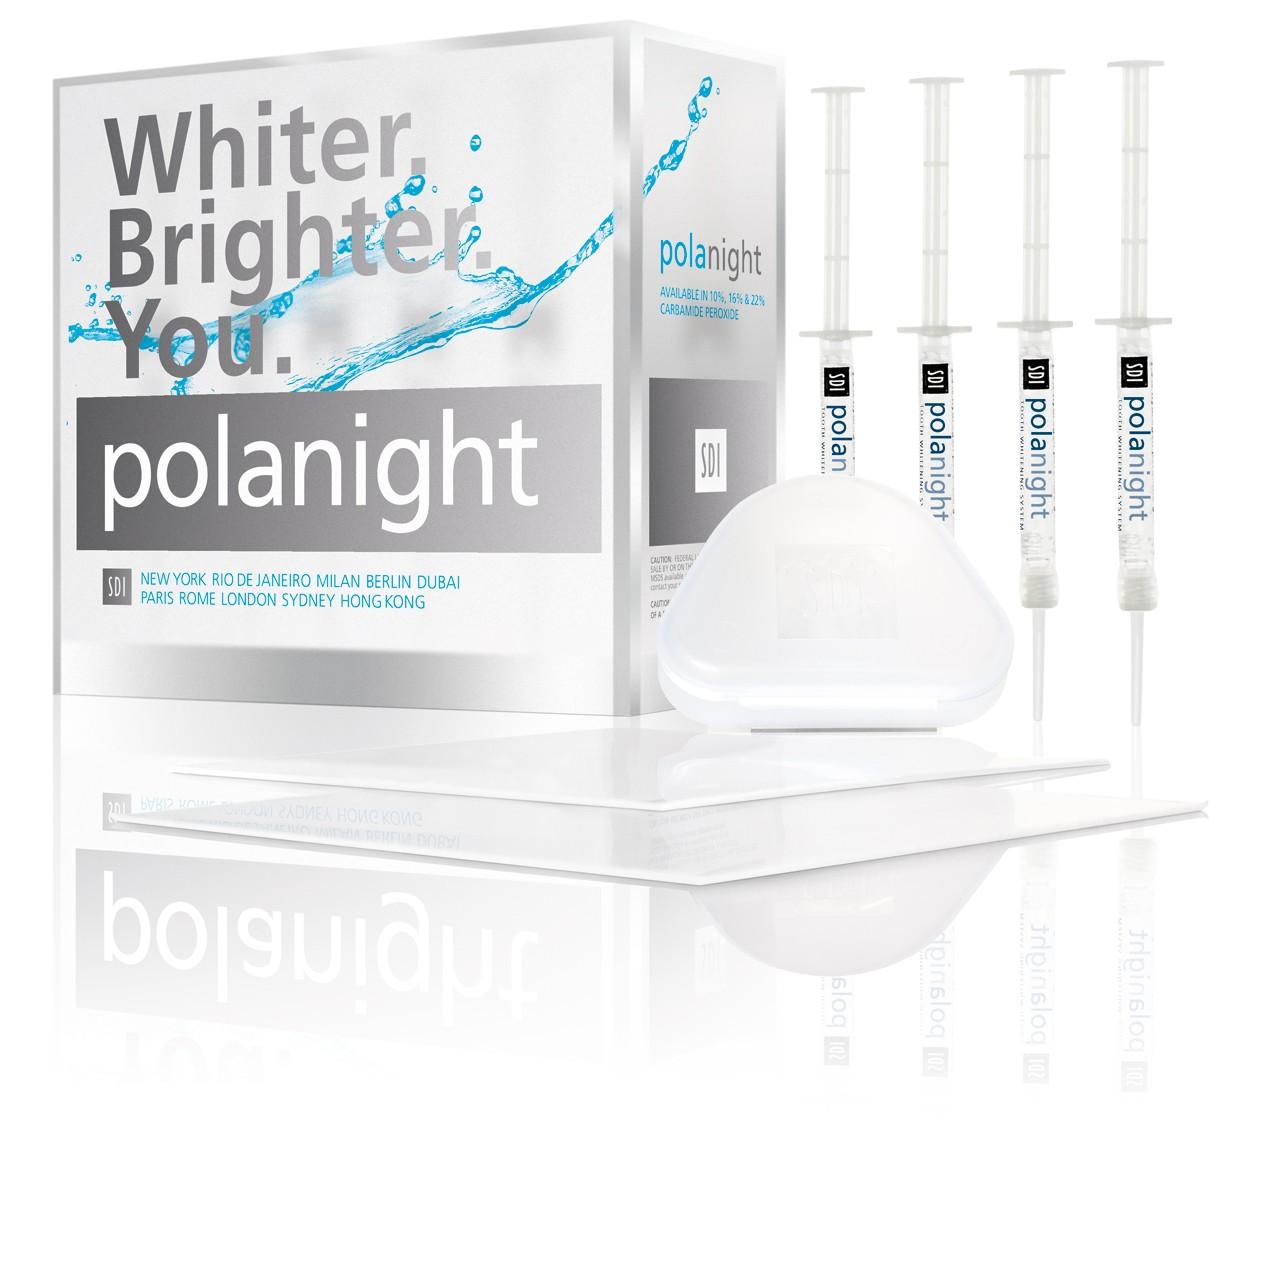 pola-night-syringe-kit-16-10-cef.jpg